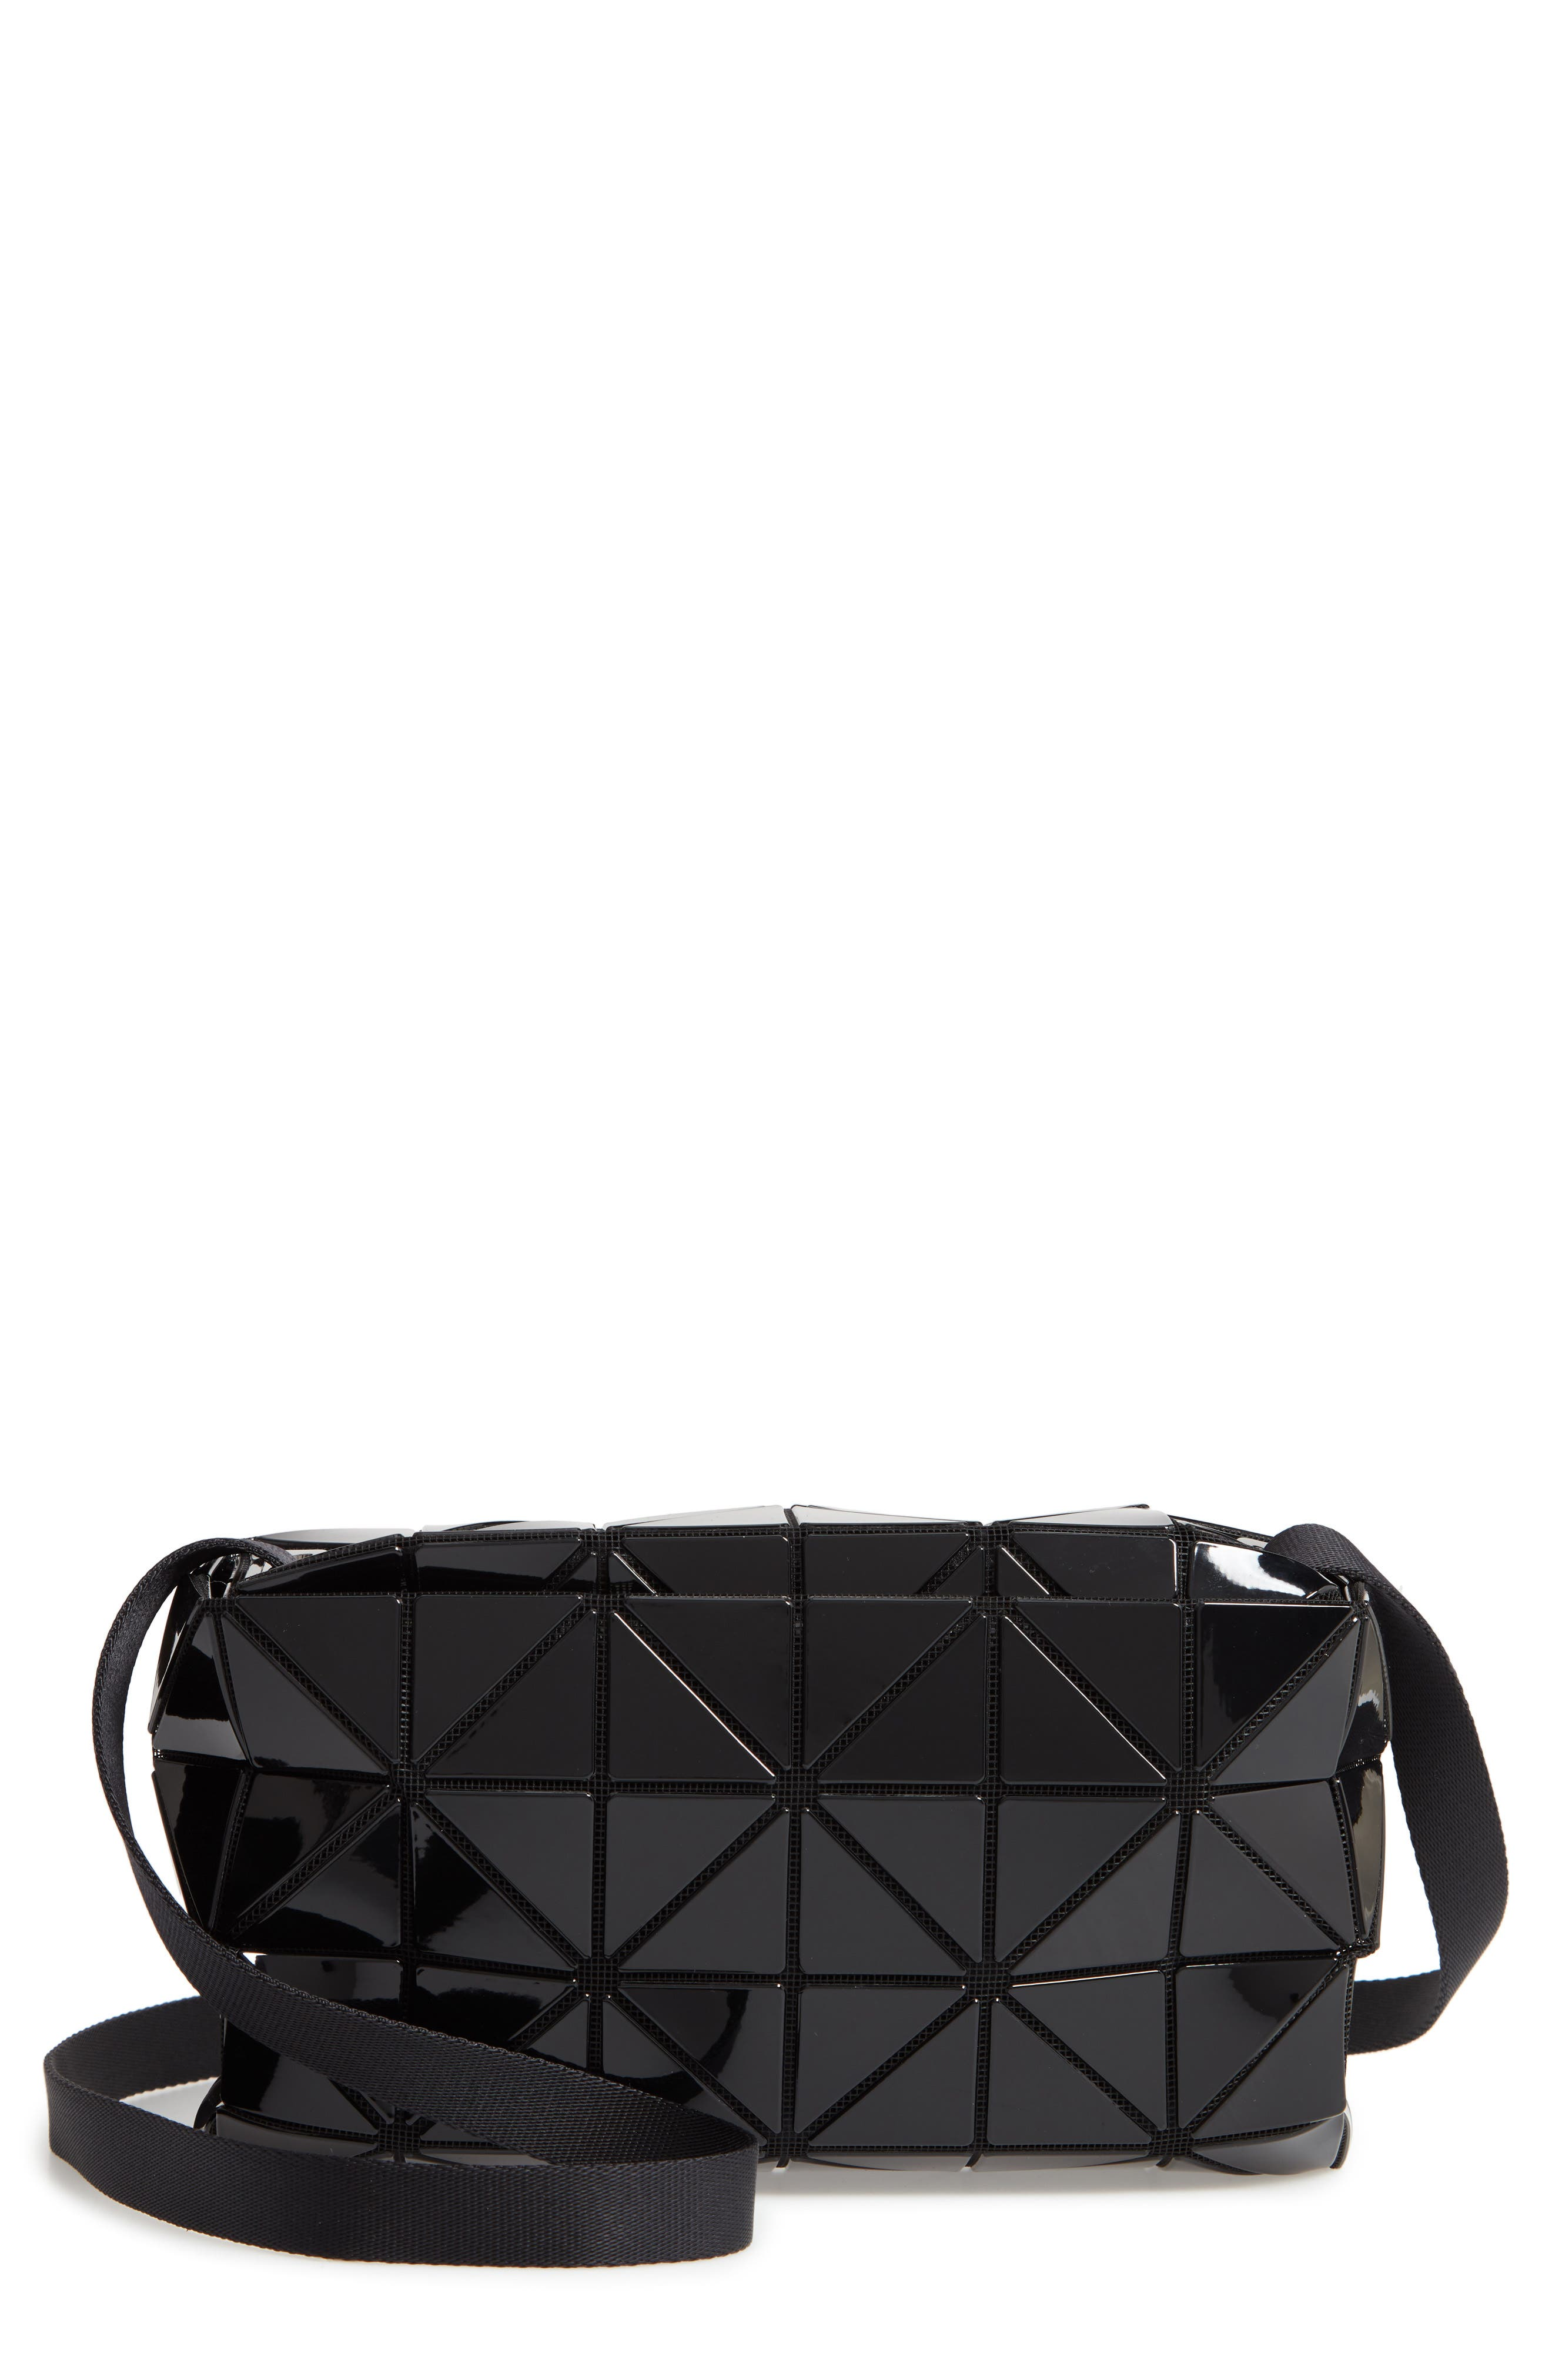 Carton Crossbody Bag,                             Main thumbnail 1, color,                             BLACK